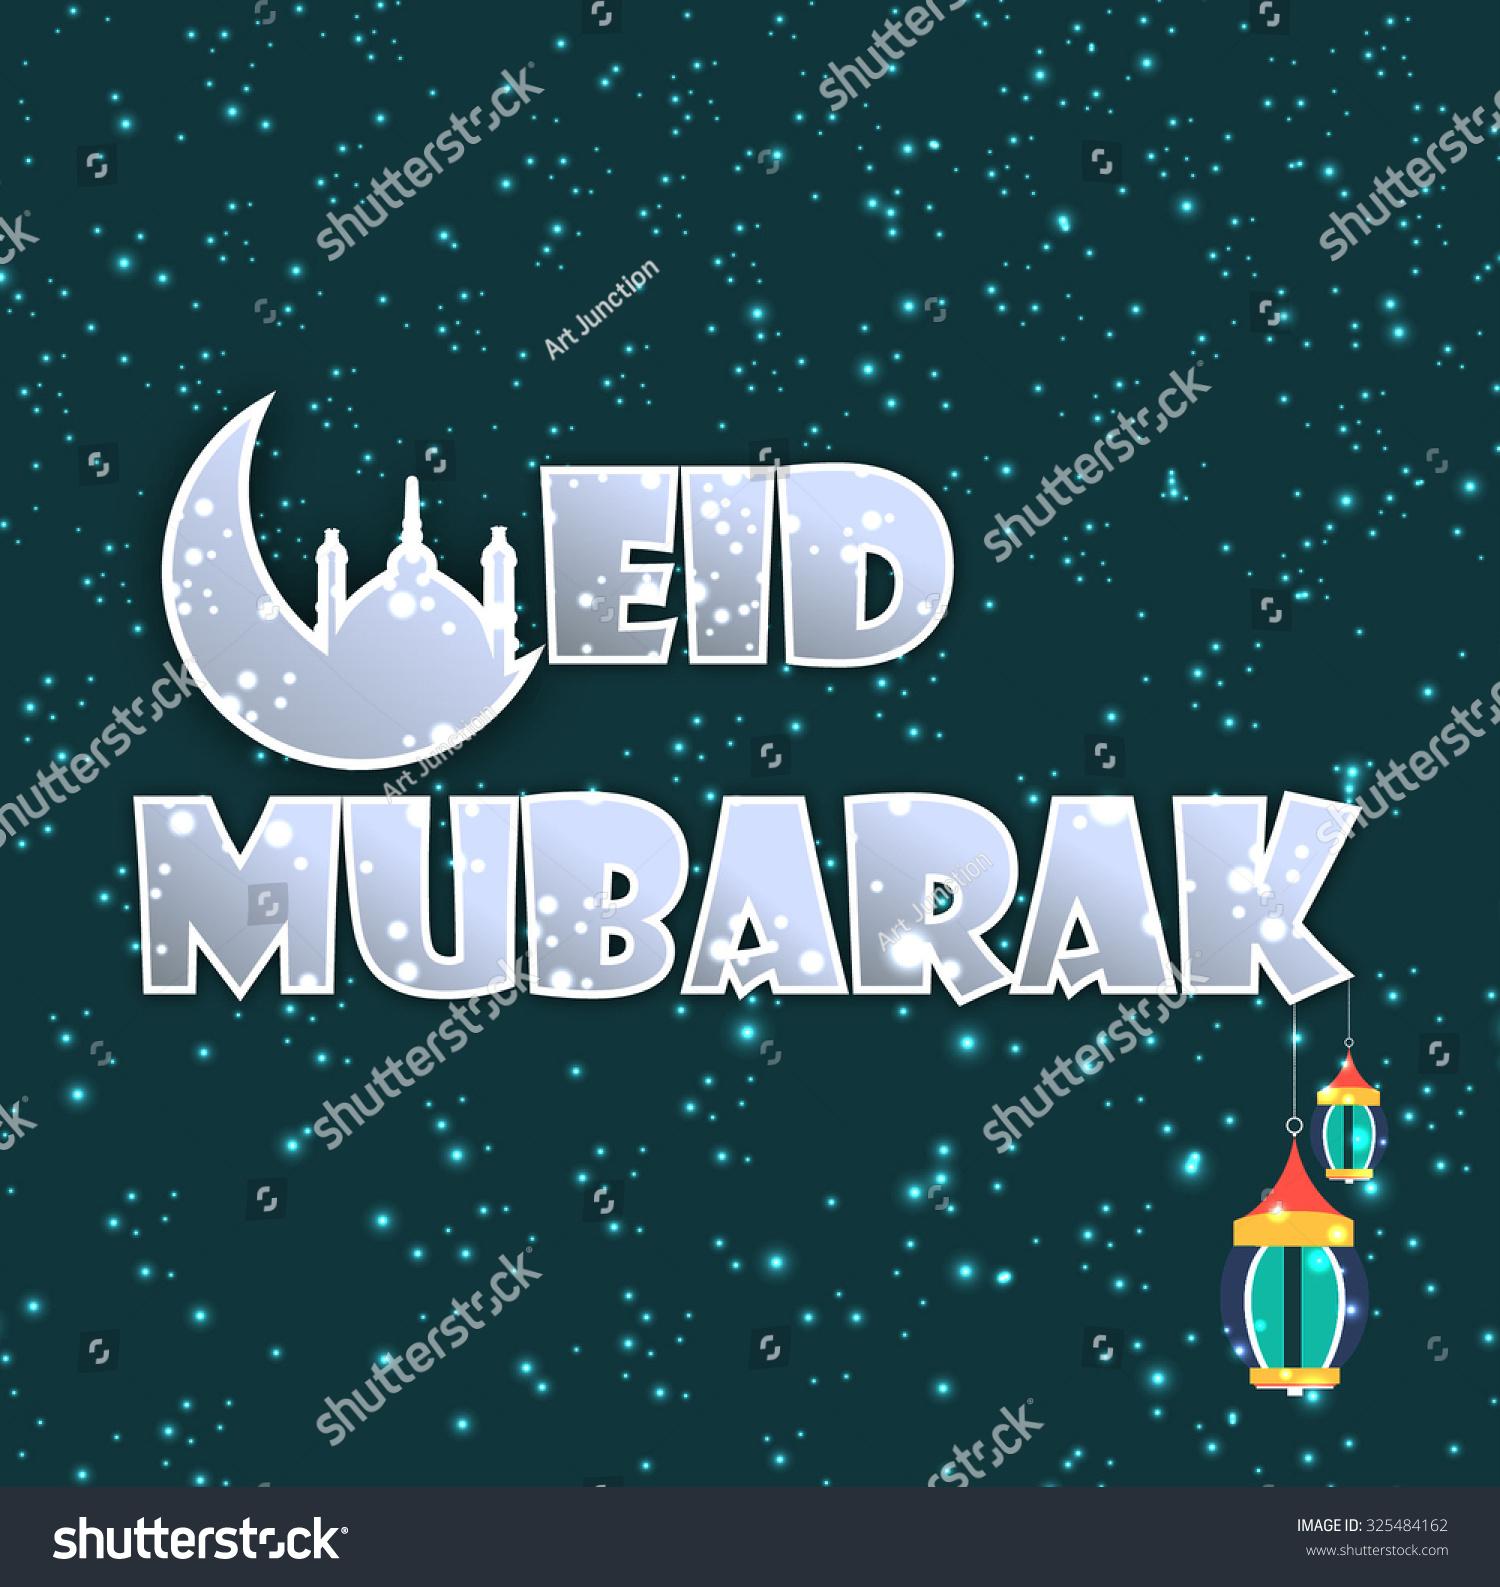 Beautiful eid mubarak card design nice stock vector 325484162 beautiful eid mubarak card design with nice colorful mosque and black background eps 10 kristyandbryce Choice Image